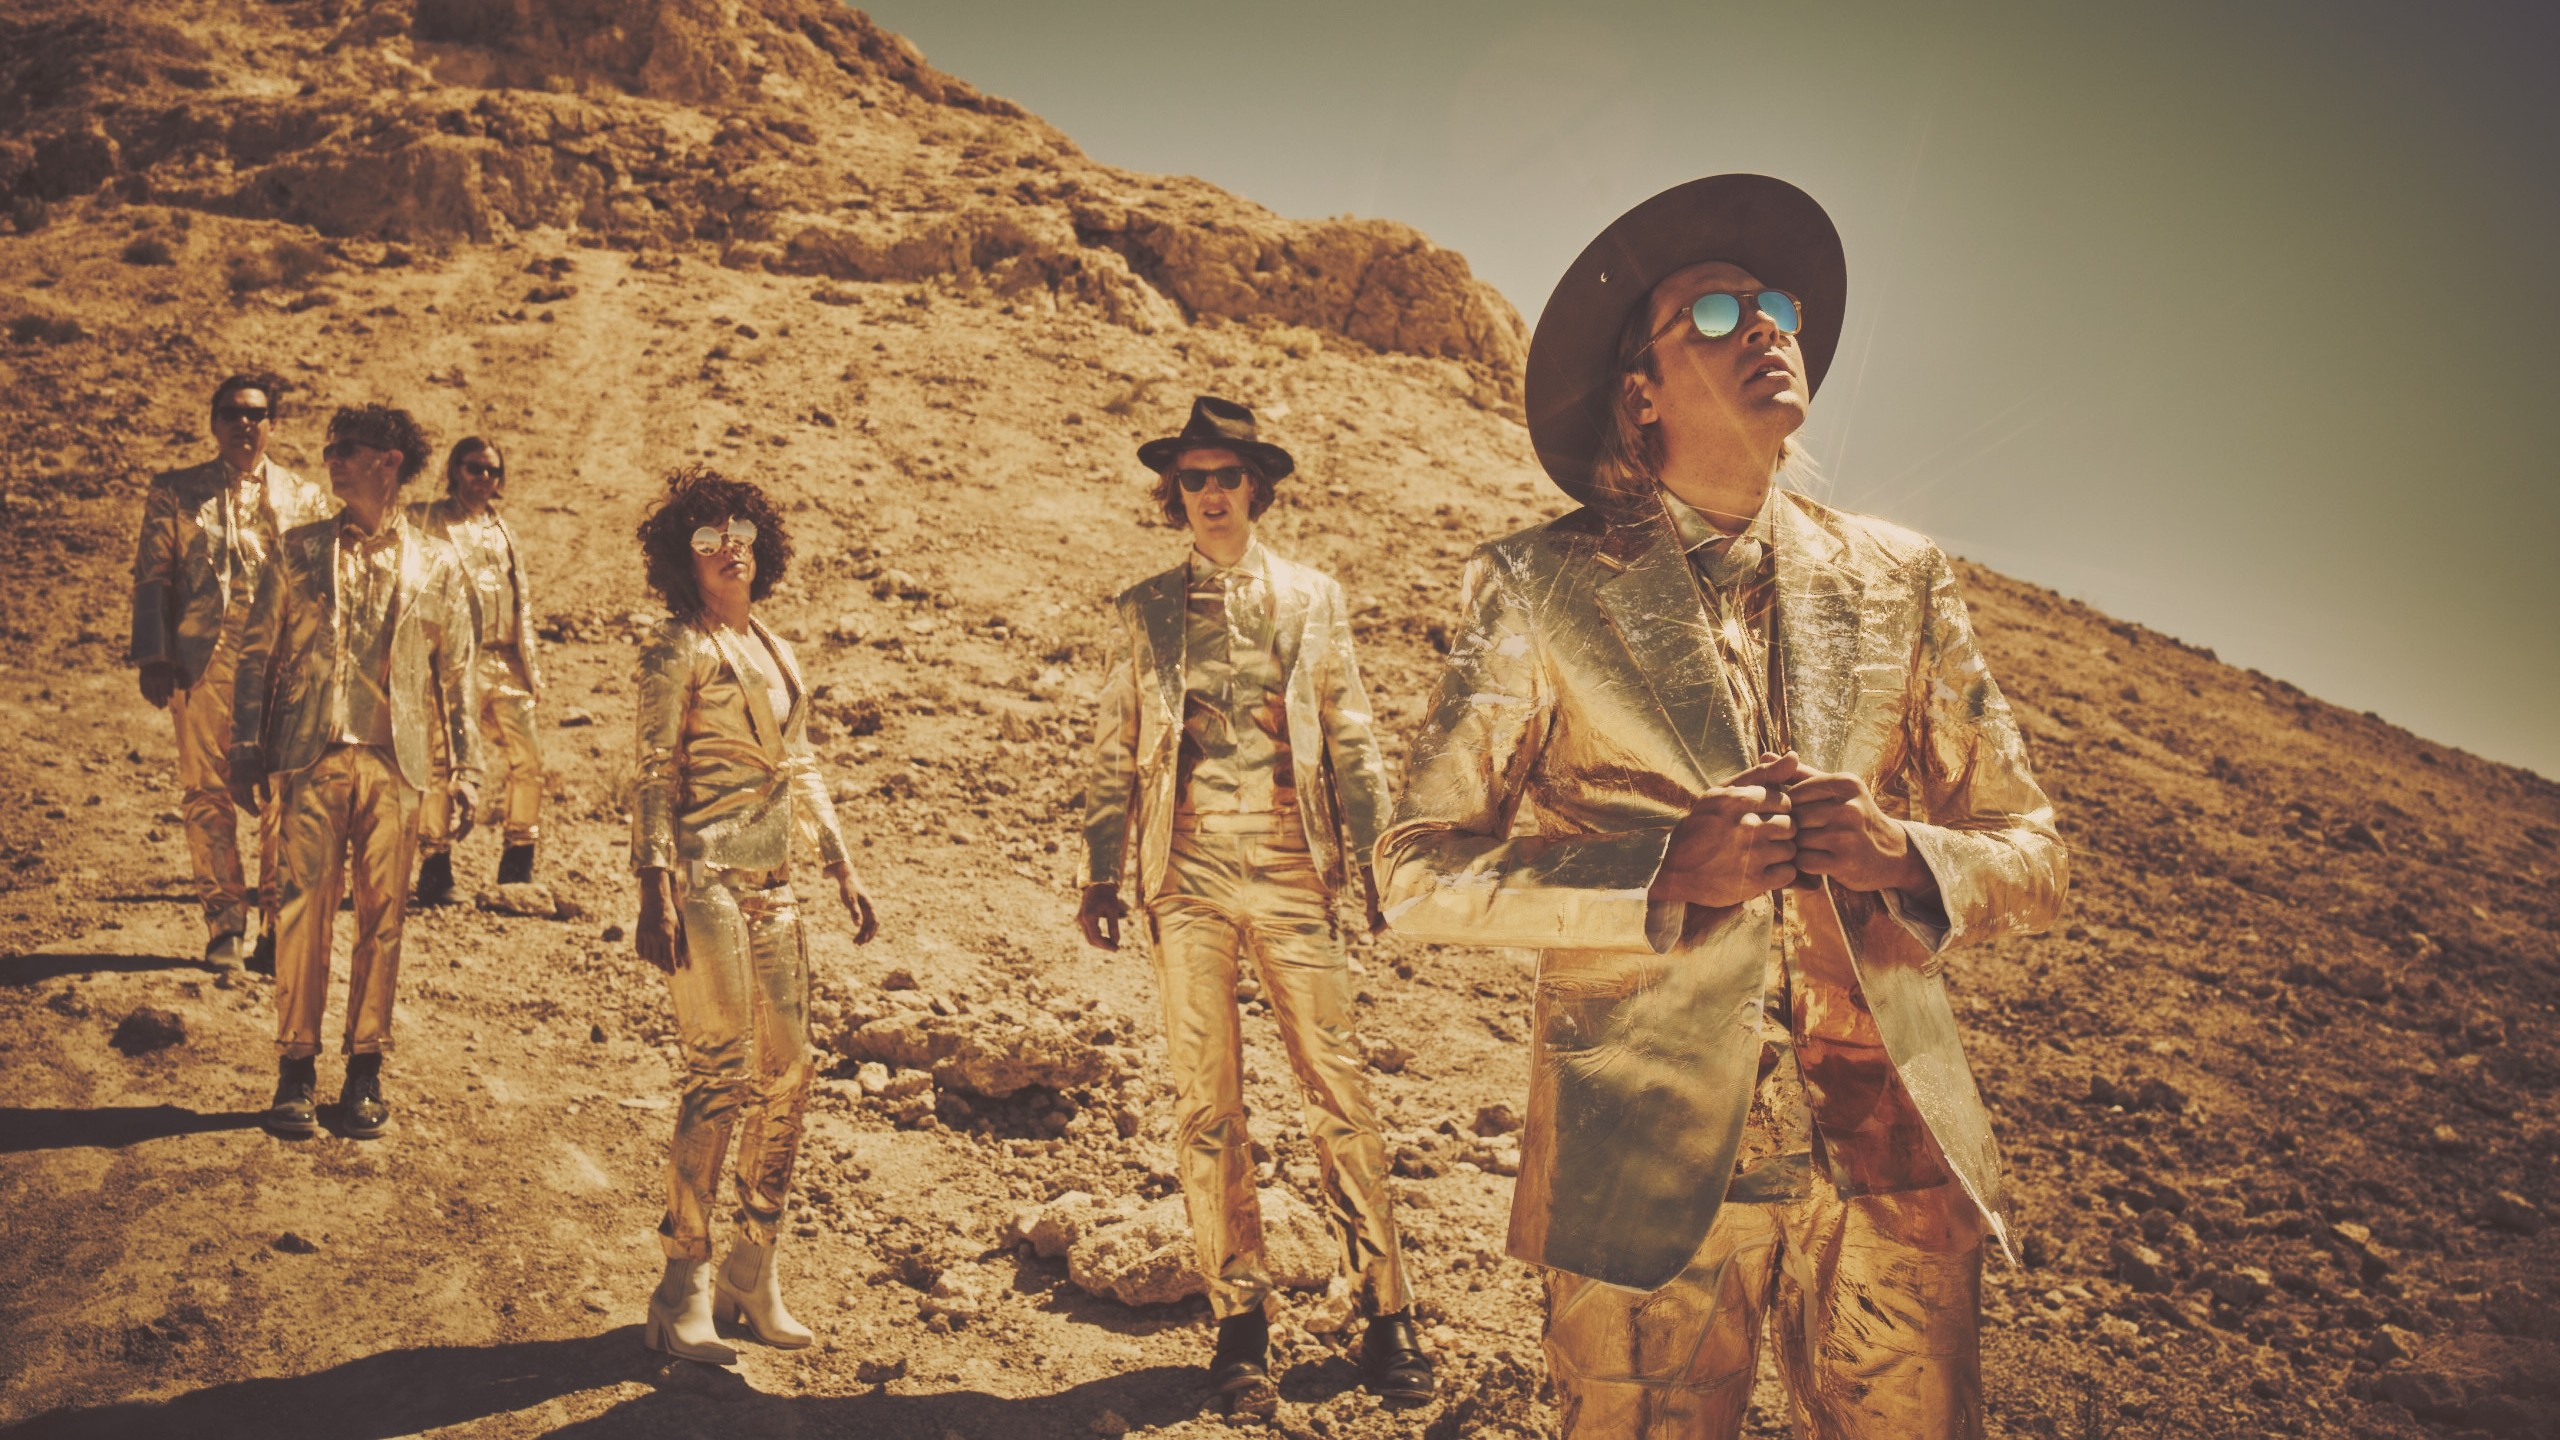 Esce 'Everything Now', il disco pop degli Arcade Fire